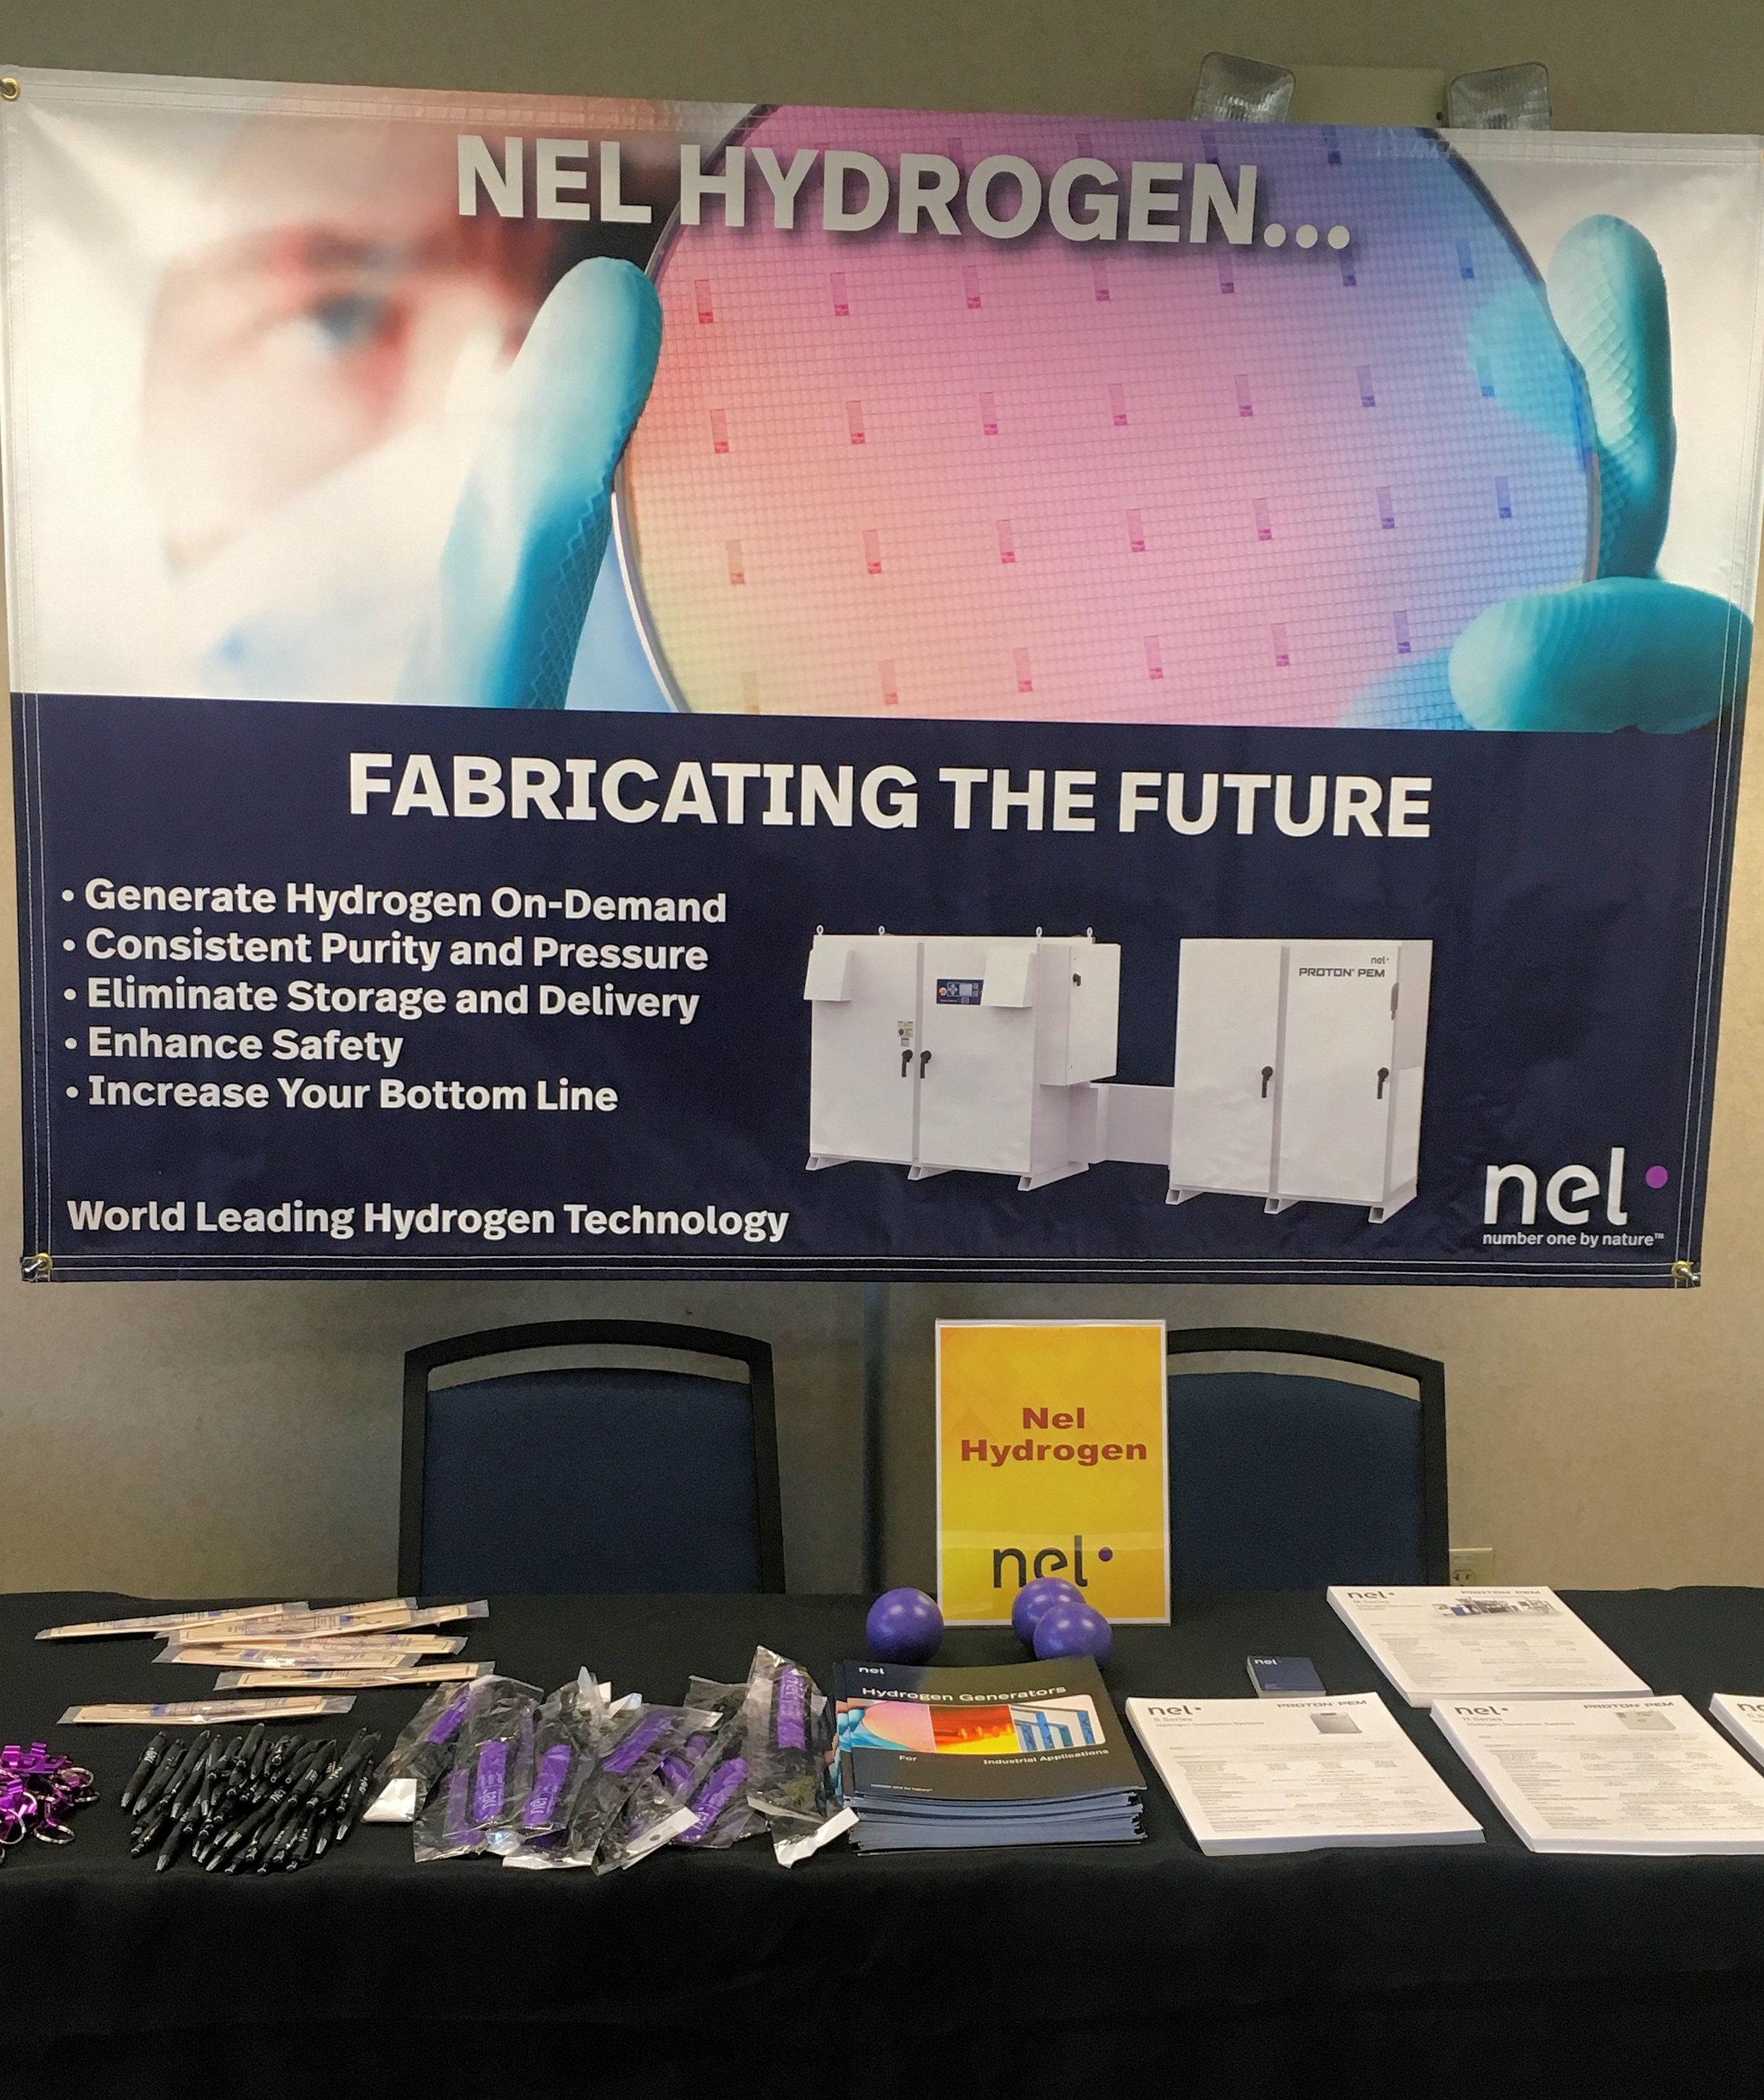 Nel Hydrogen exhibit